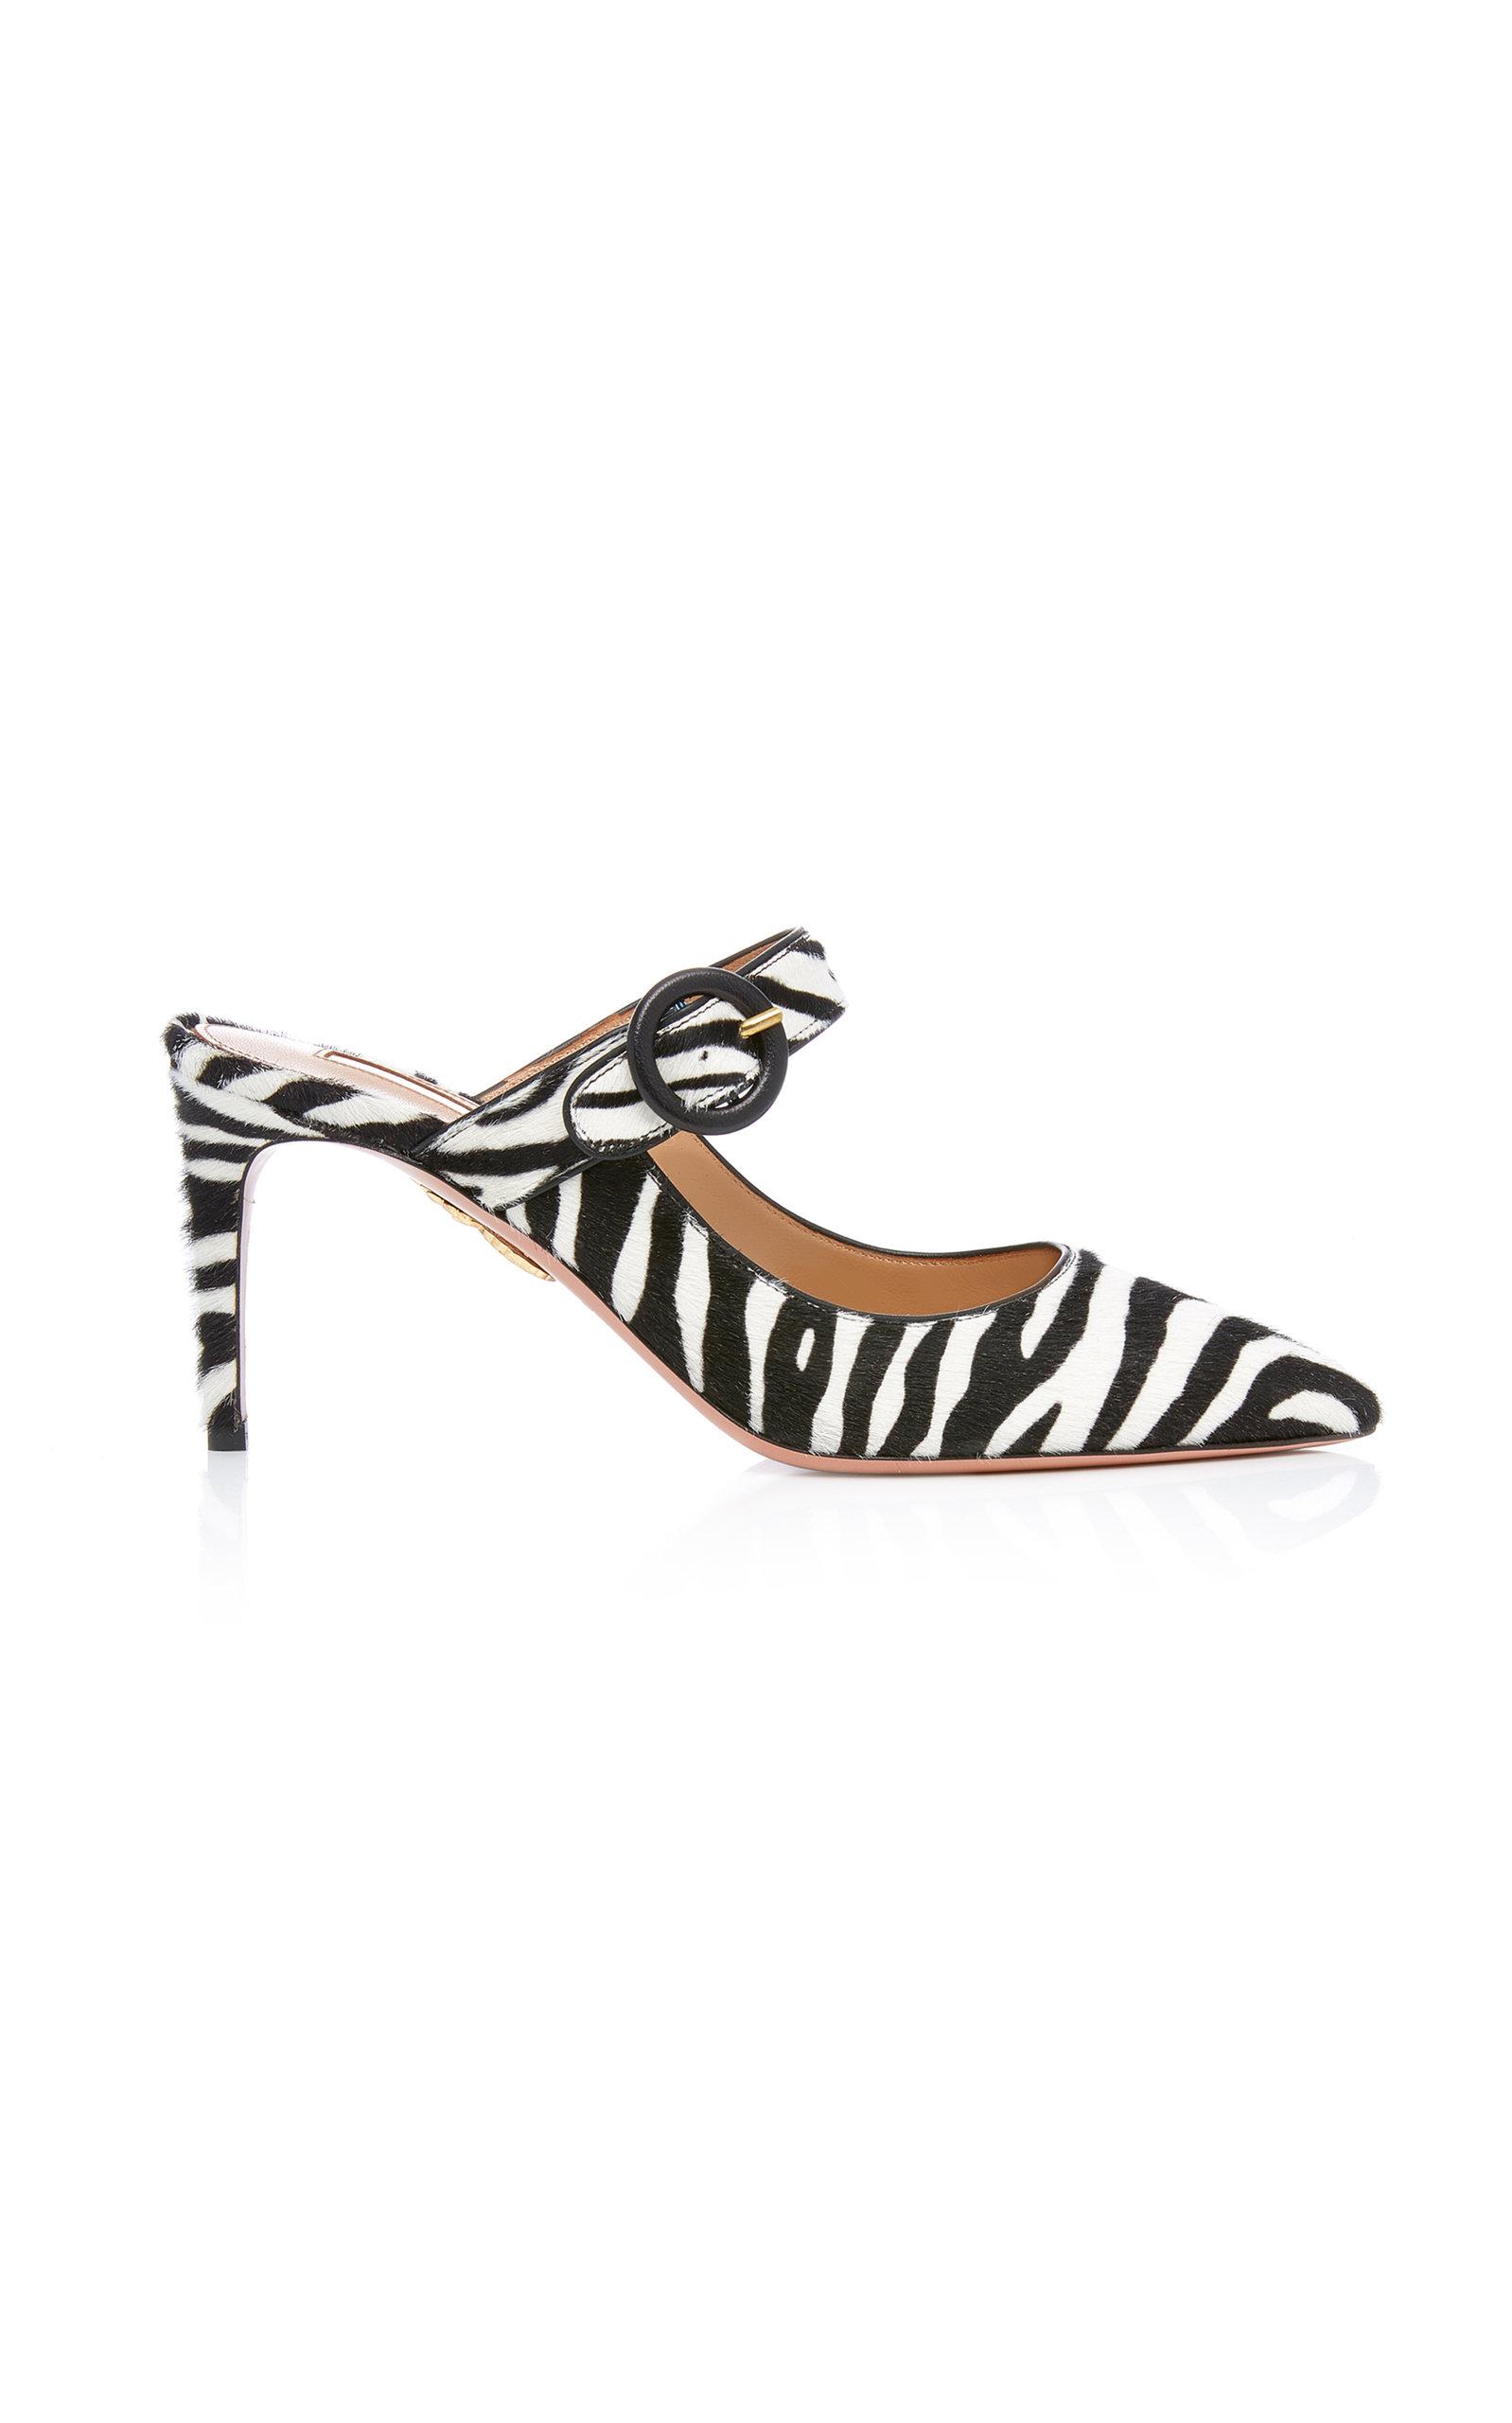 Blossom Zebra-Print Calf Hair Mules in Zebra Print